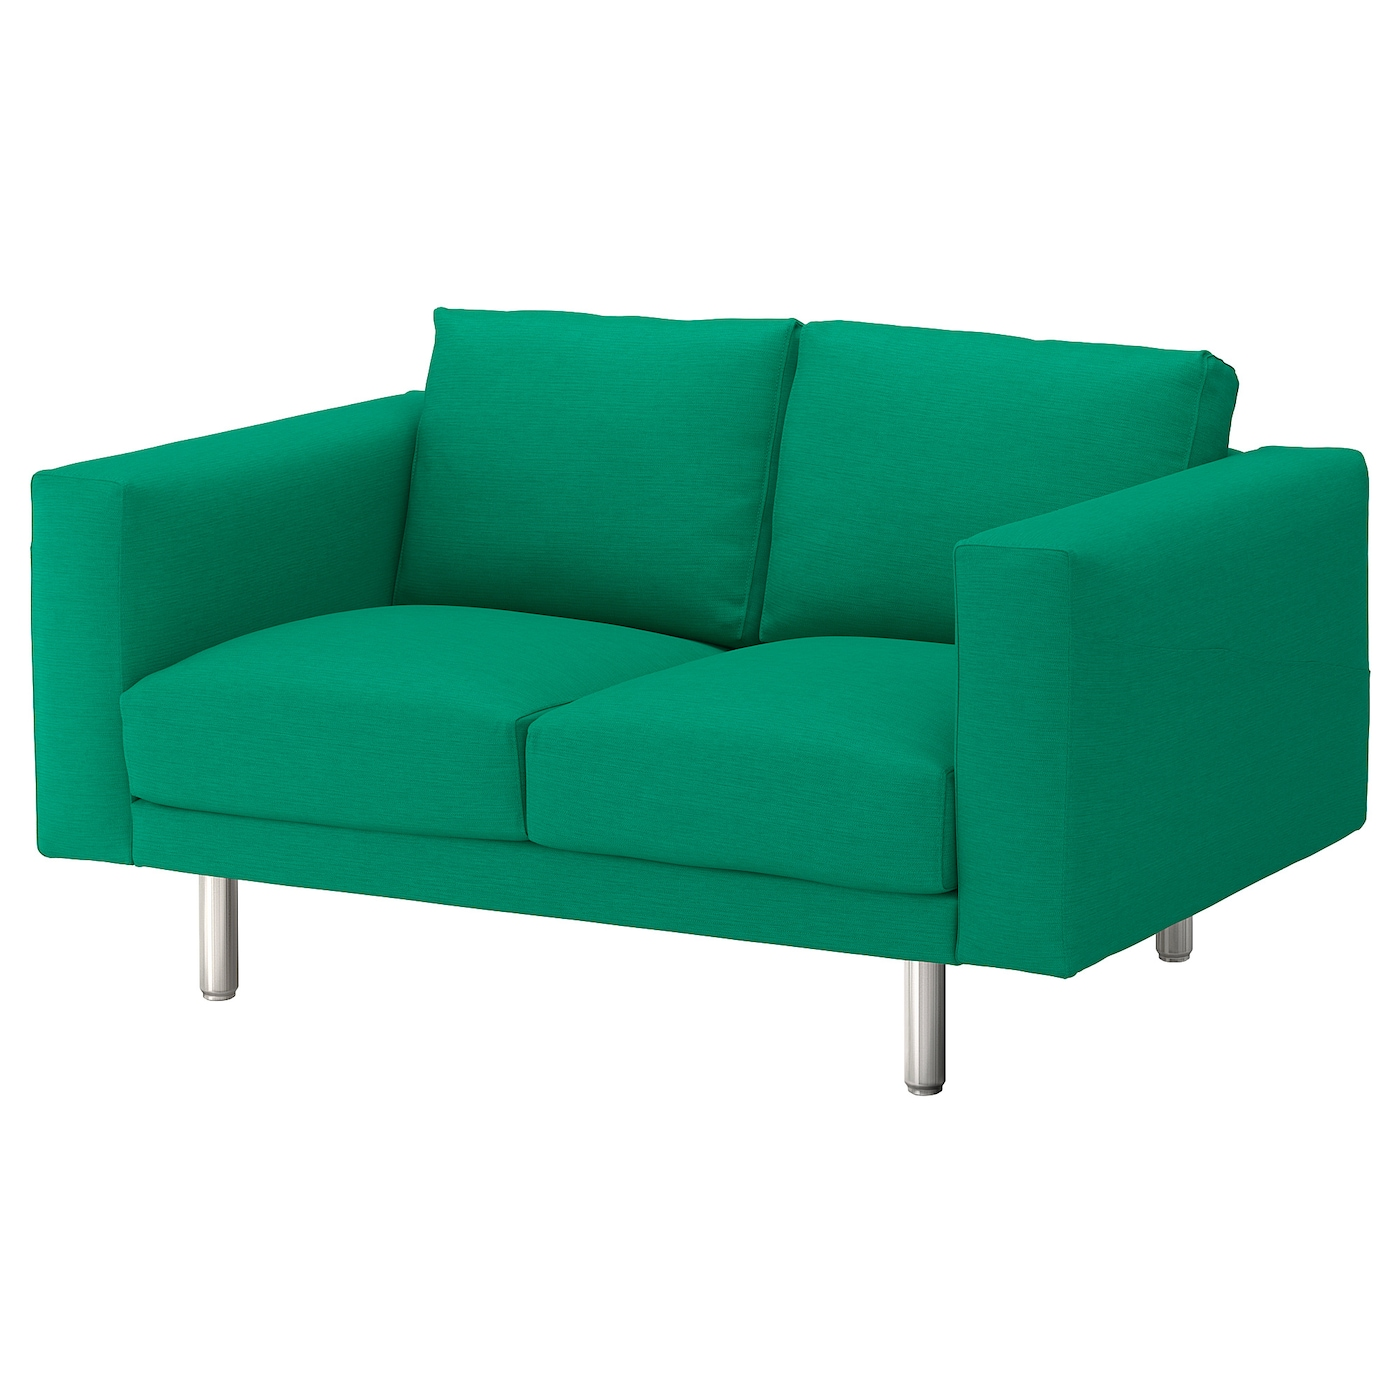 Norsborg canap 2 places edum vert vif m tal ikea for Ikea canape vert